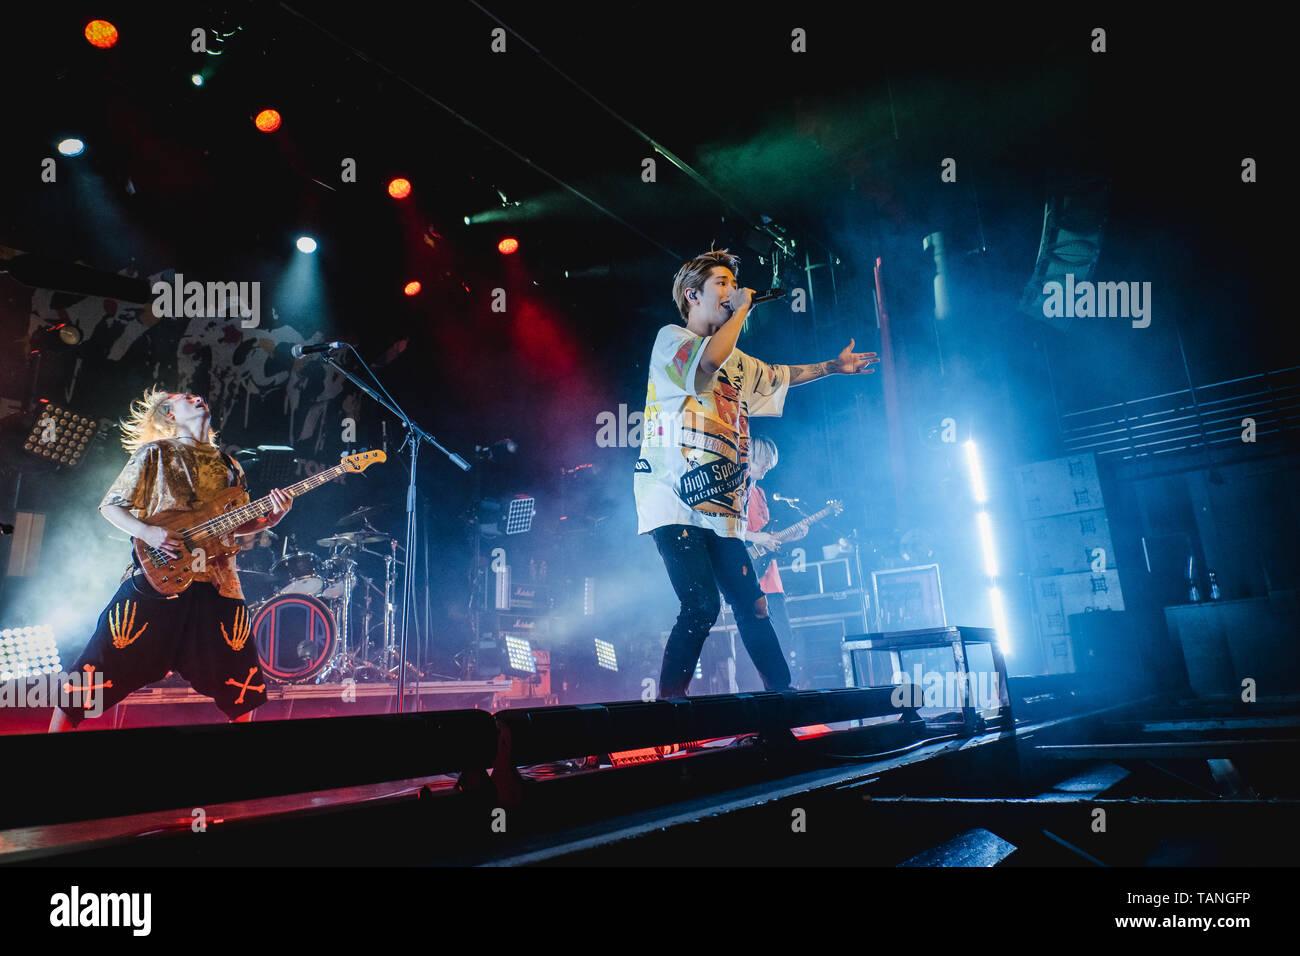 Switzerland, Zurich - May 24, 2019  The Japanese rock band